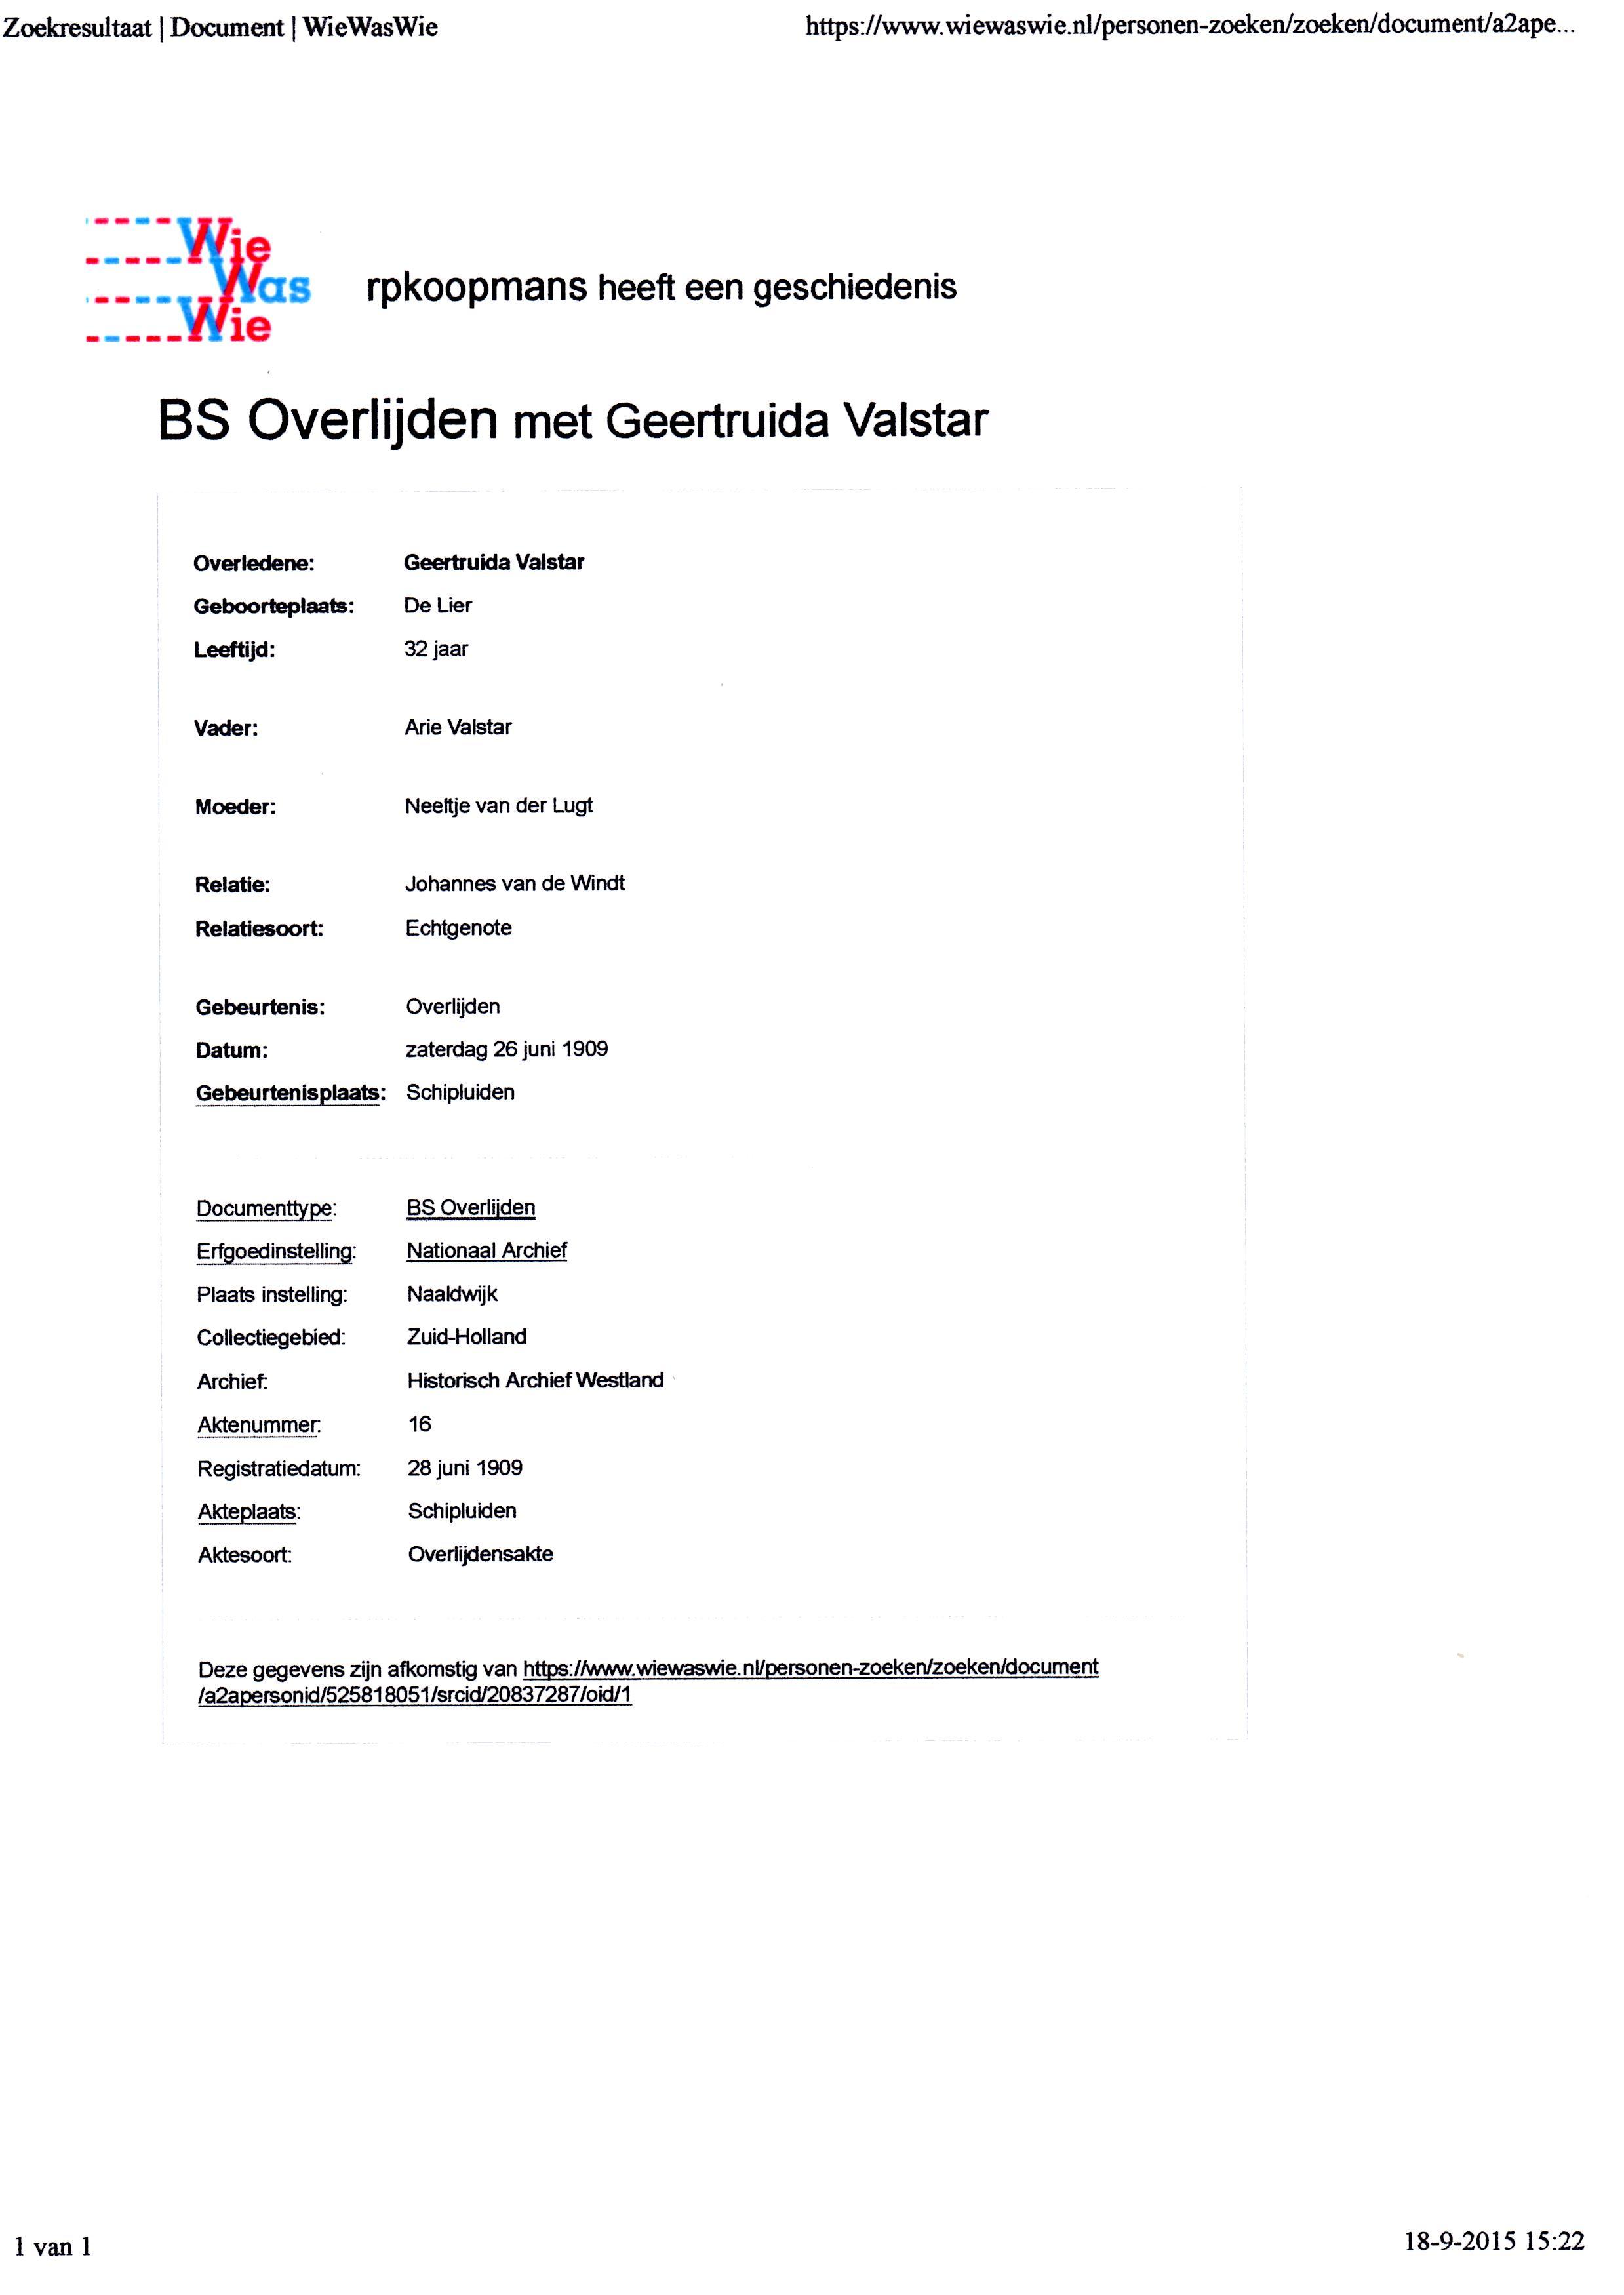 1909-06-26 Overlijden Geertruida Valstar